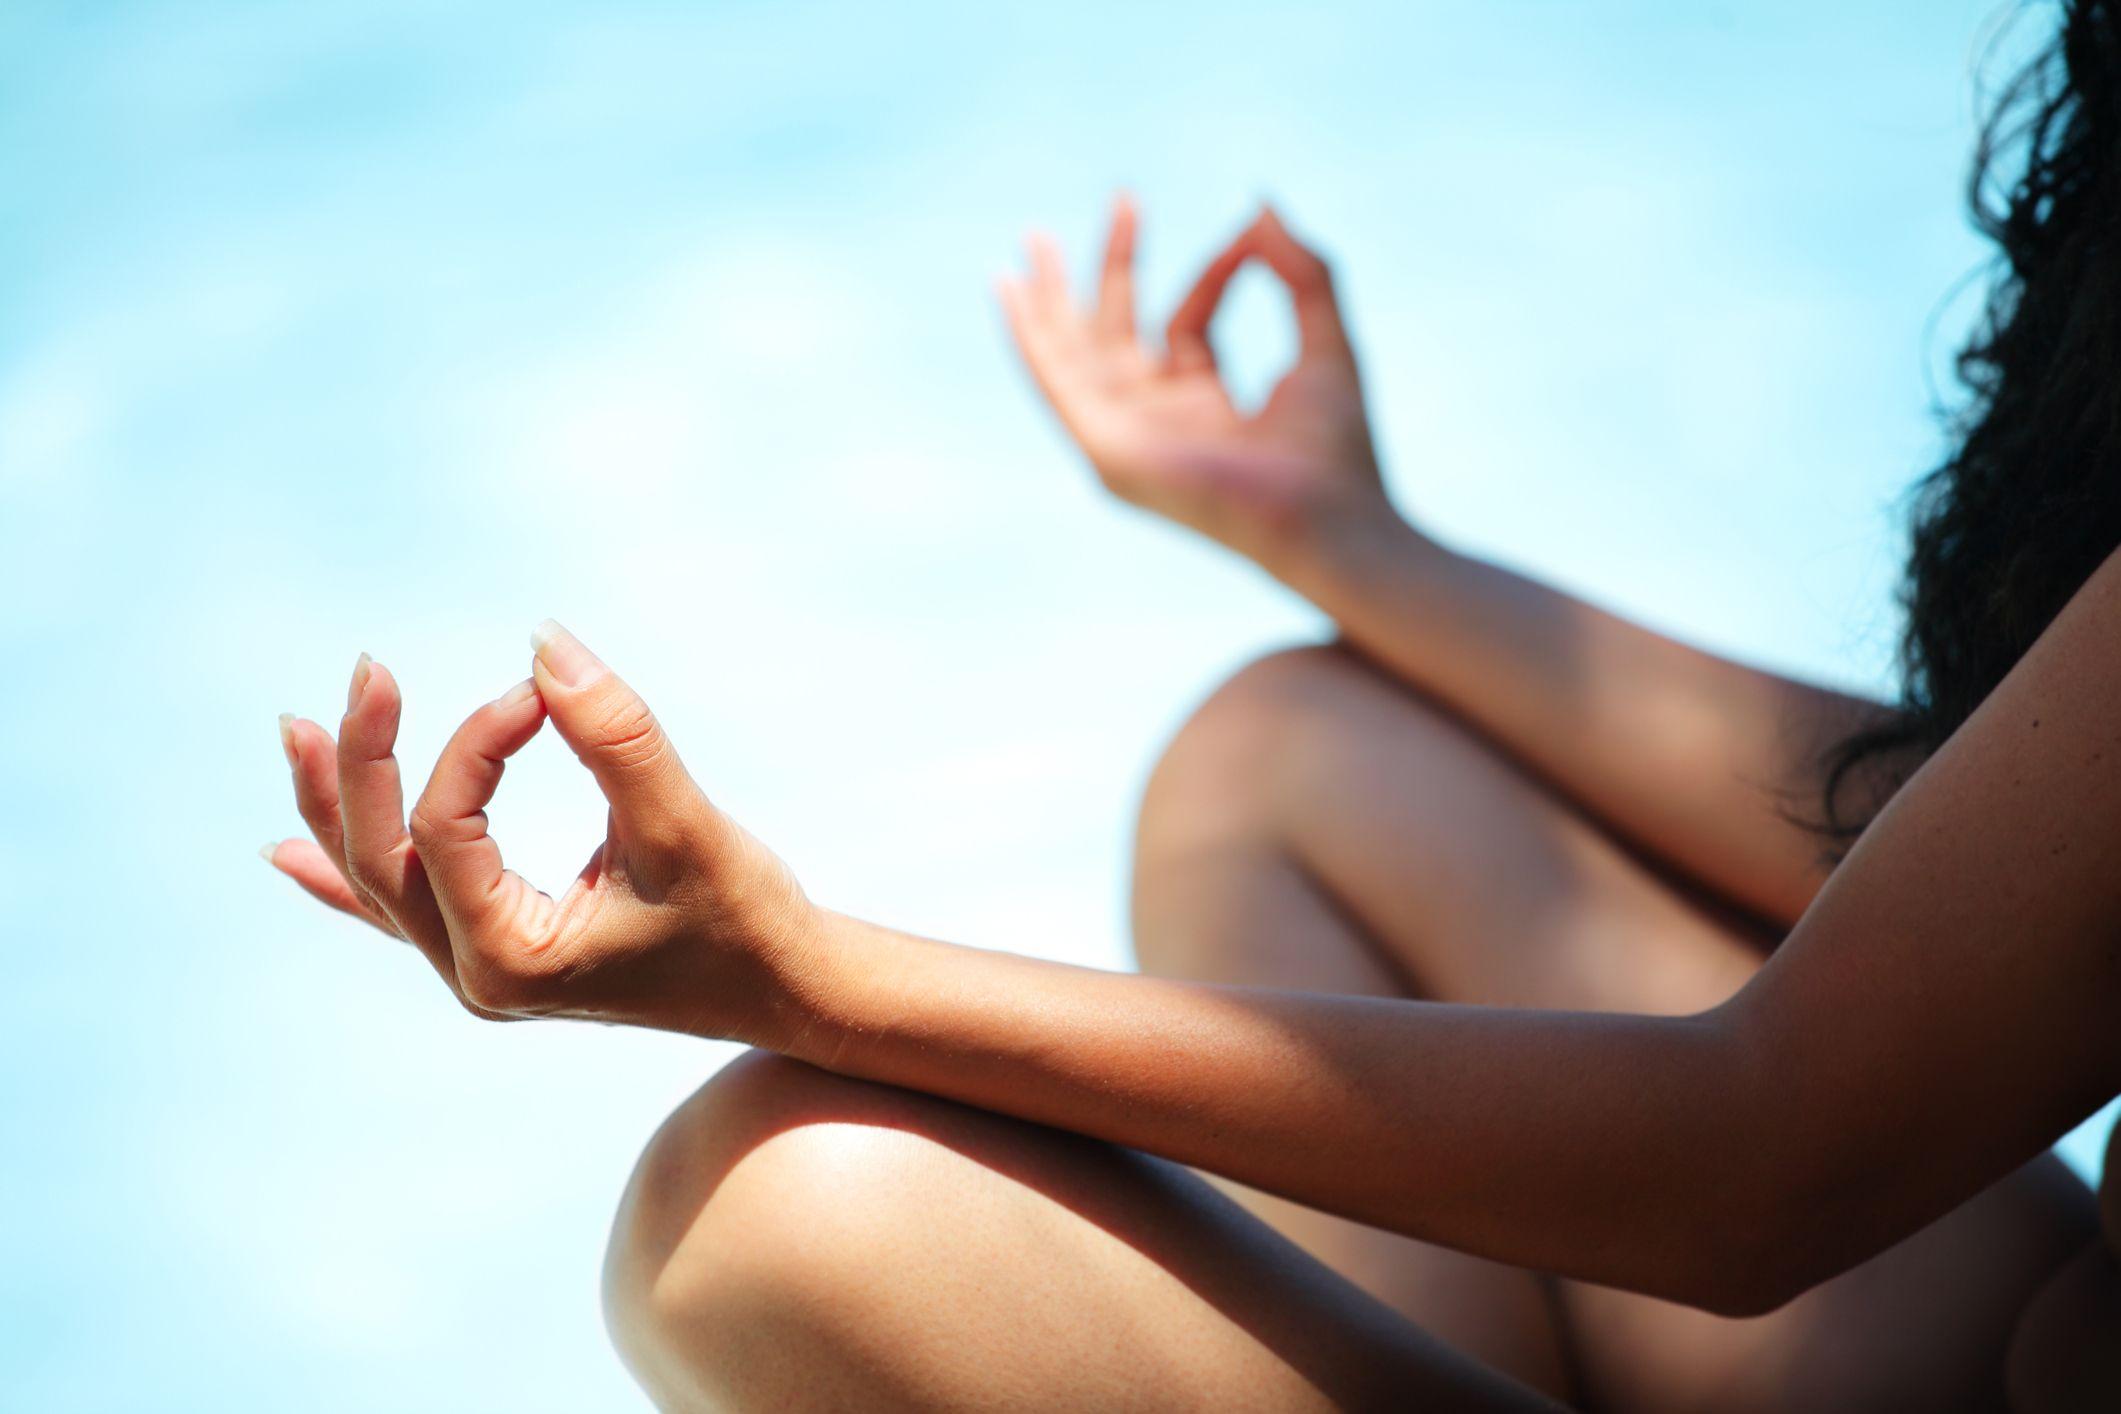 Nude yoga stretching exercises